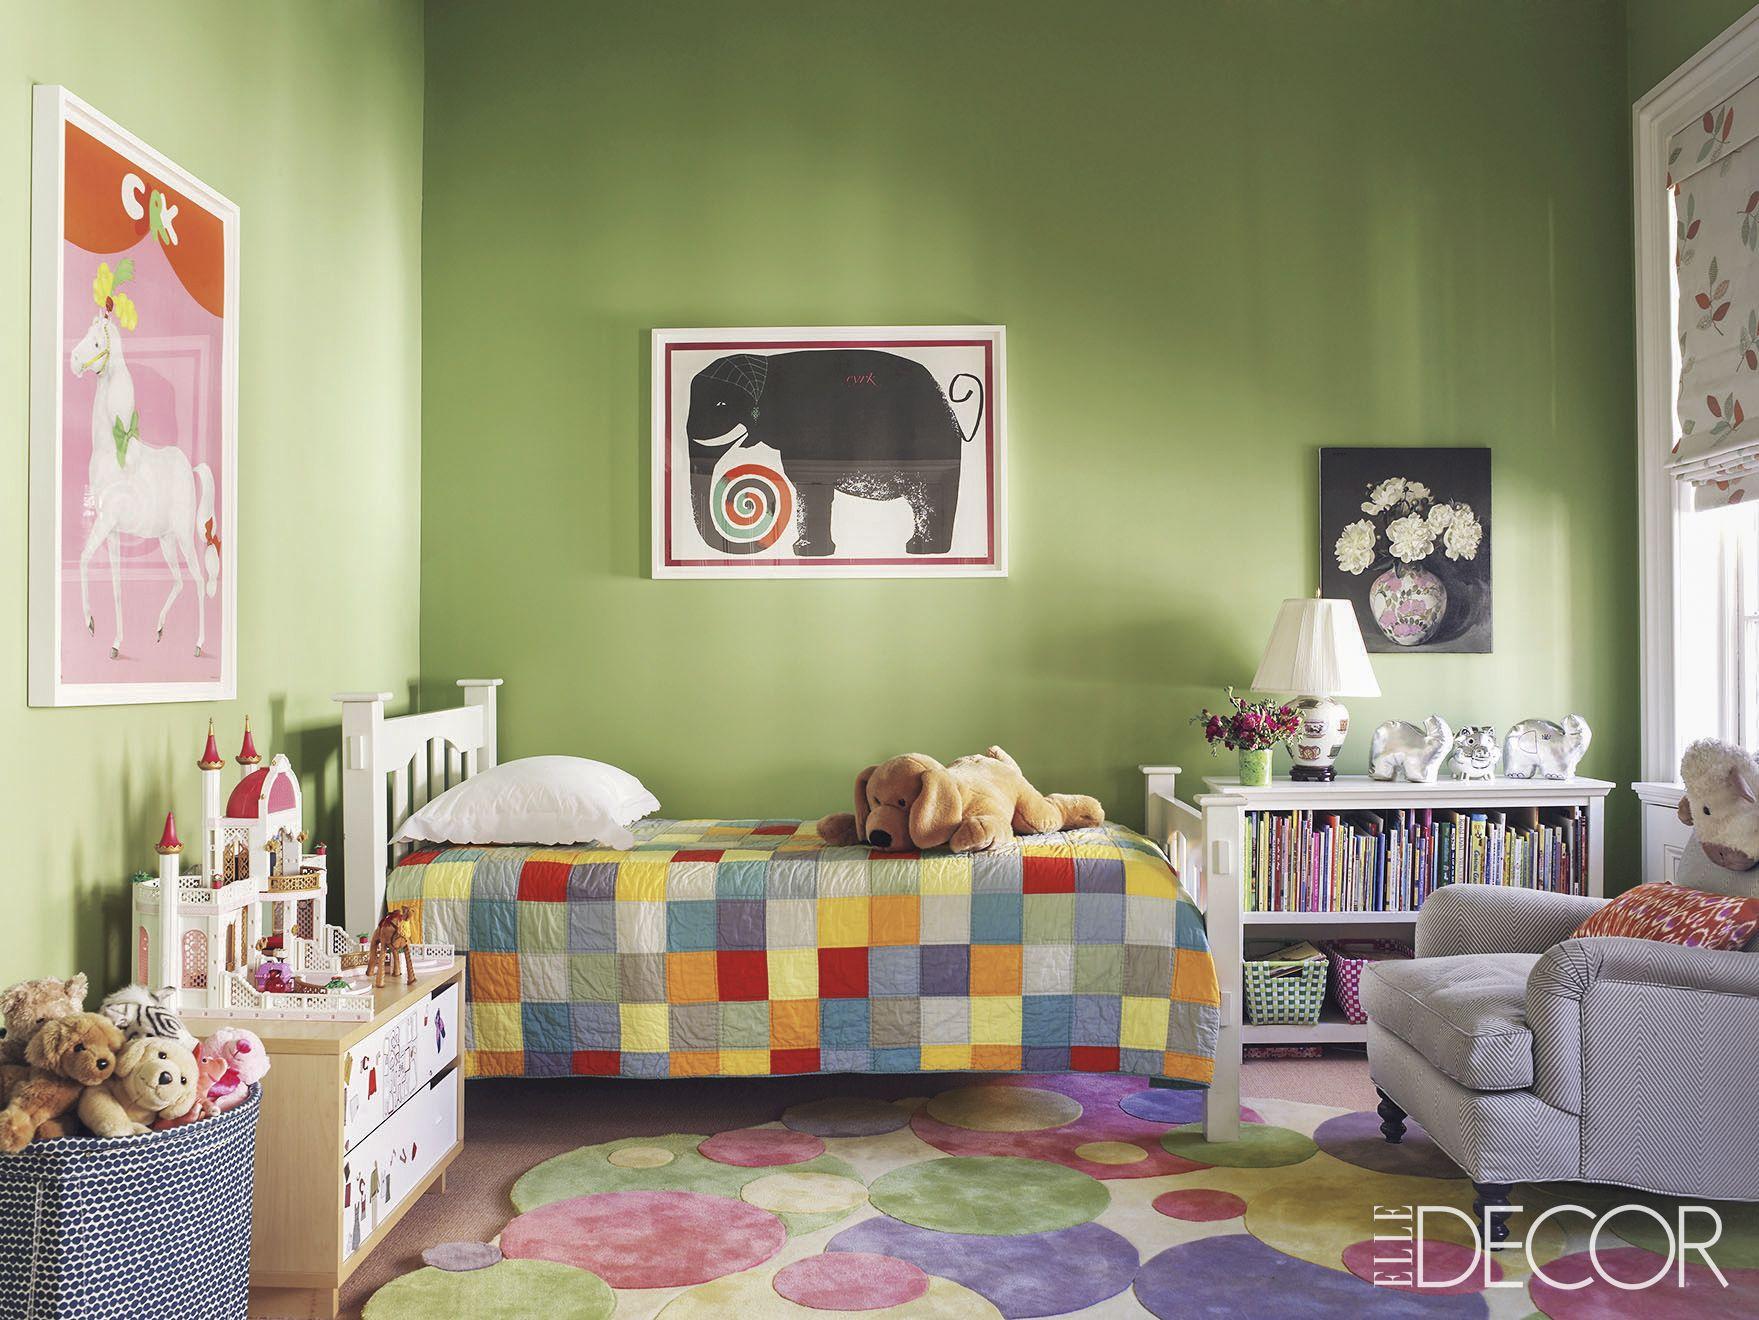 18 Cool Kids' Room Decorating Ideas